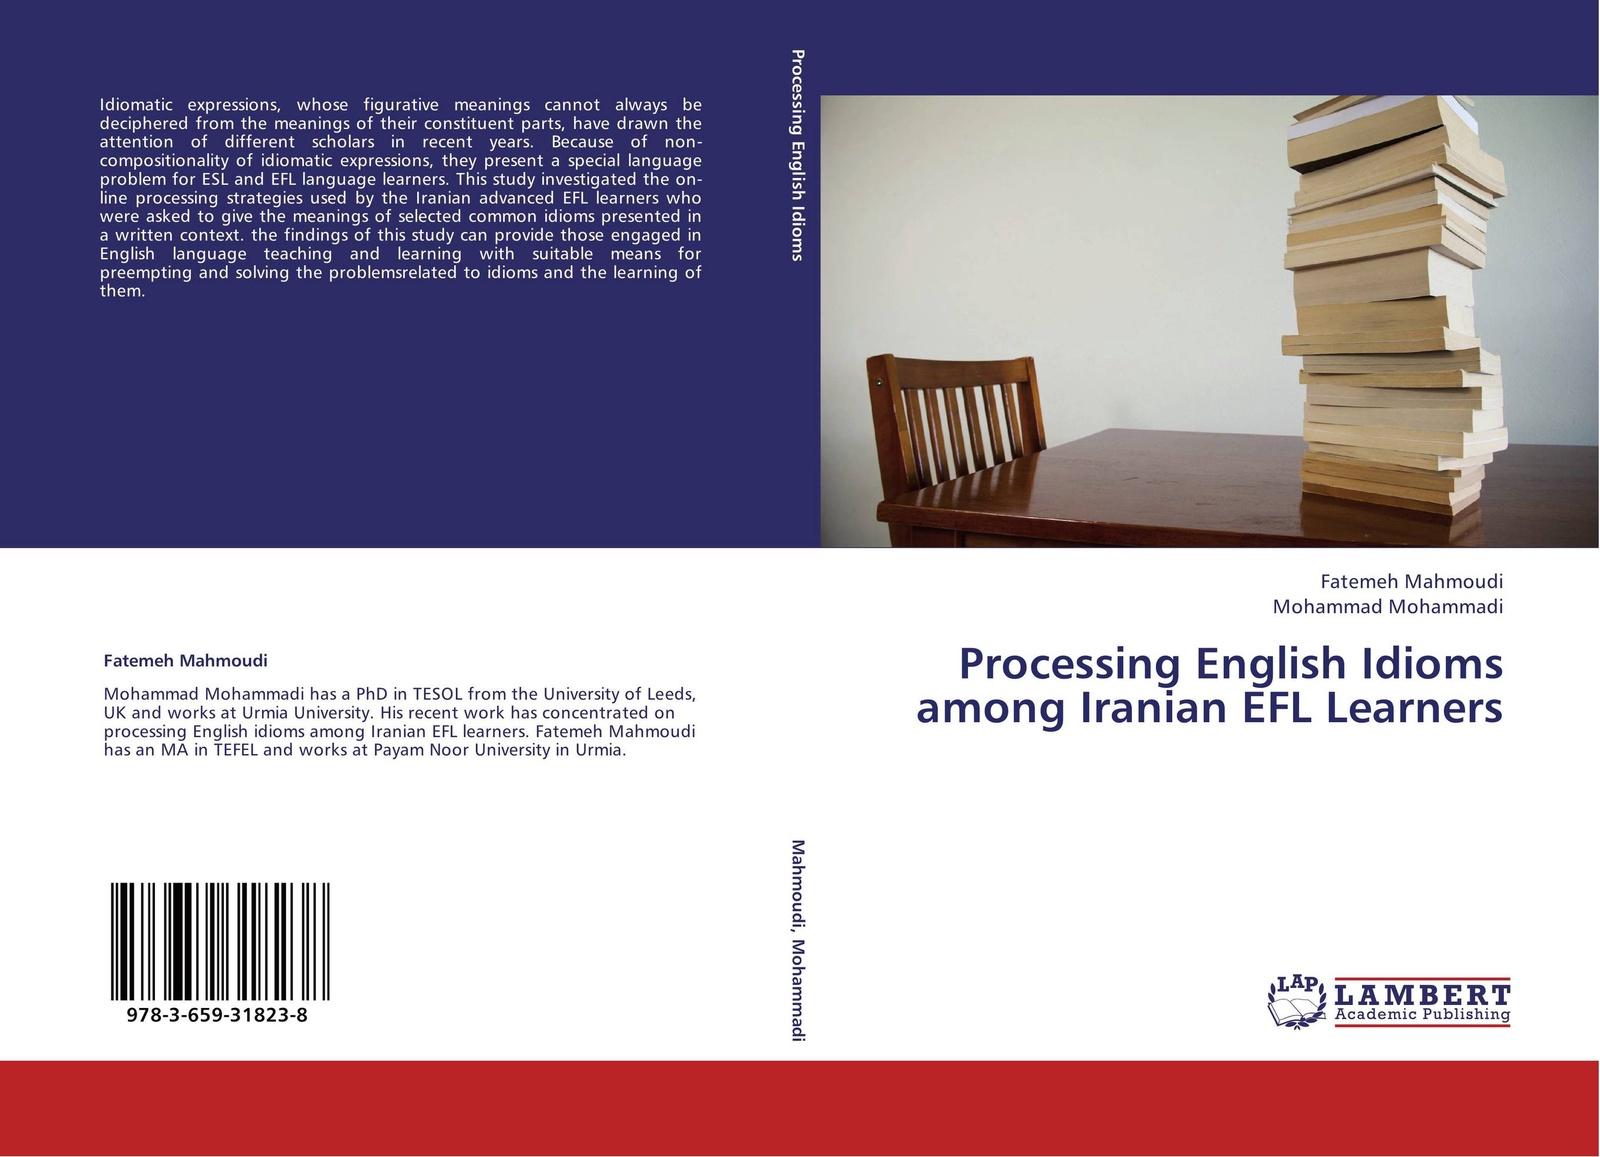 Fatemeh Mahmoudi and Mohammad Mohammadi Processing English Idioms among Iranian EFL Learners цена